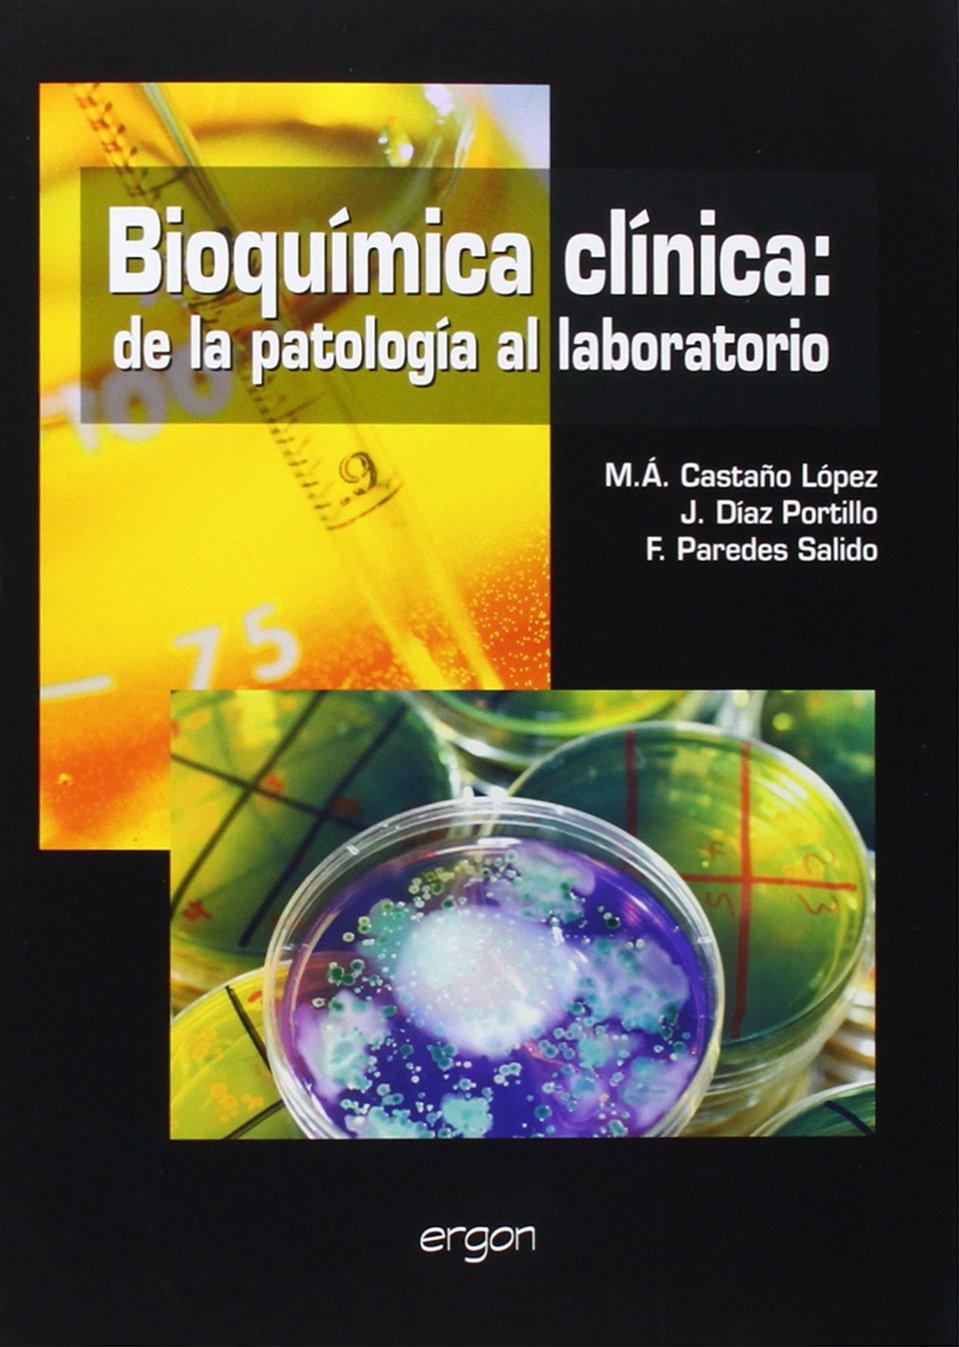 Download BIOQUIMICA CLINICA PATOLOGIA LAB.ERGON pdf epub